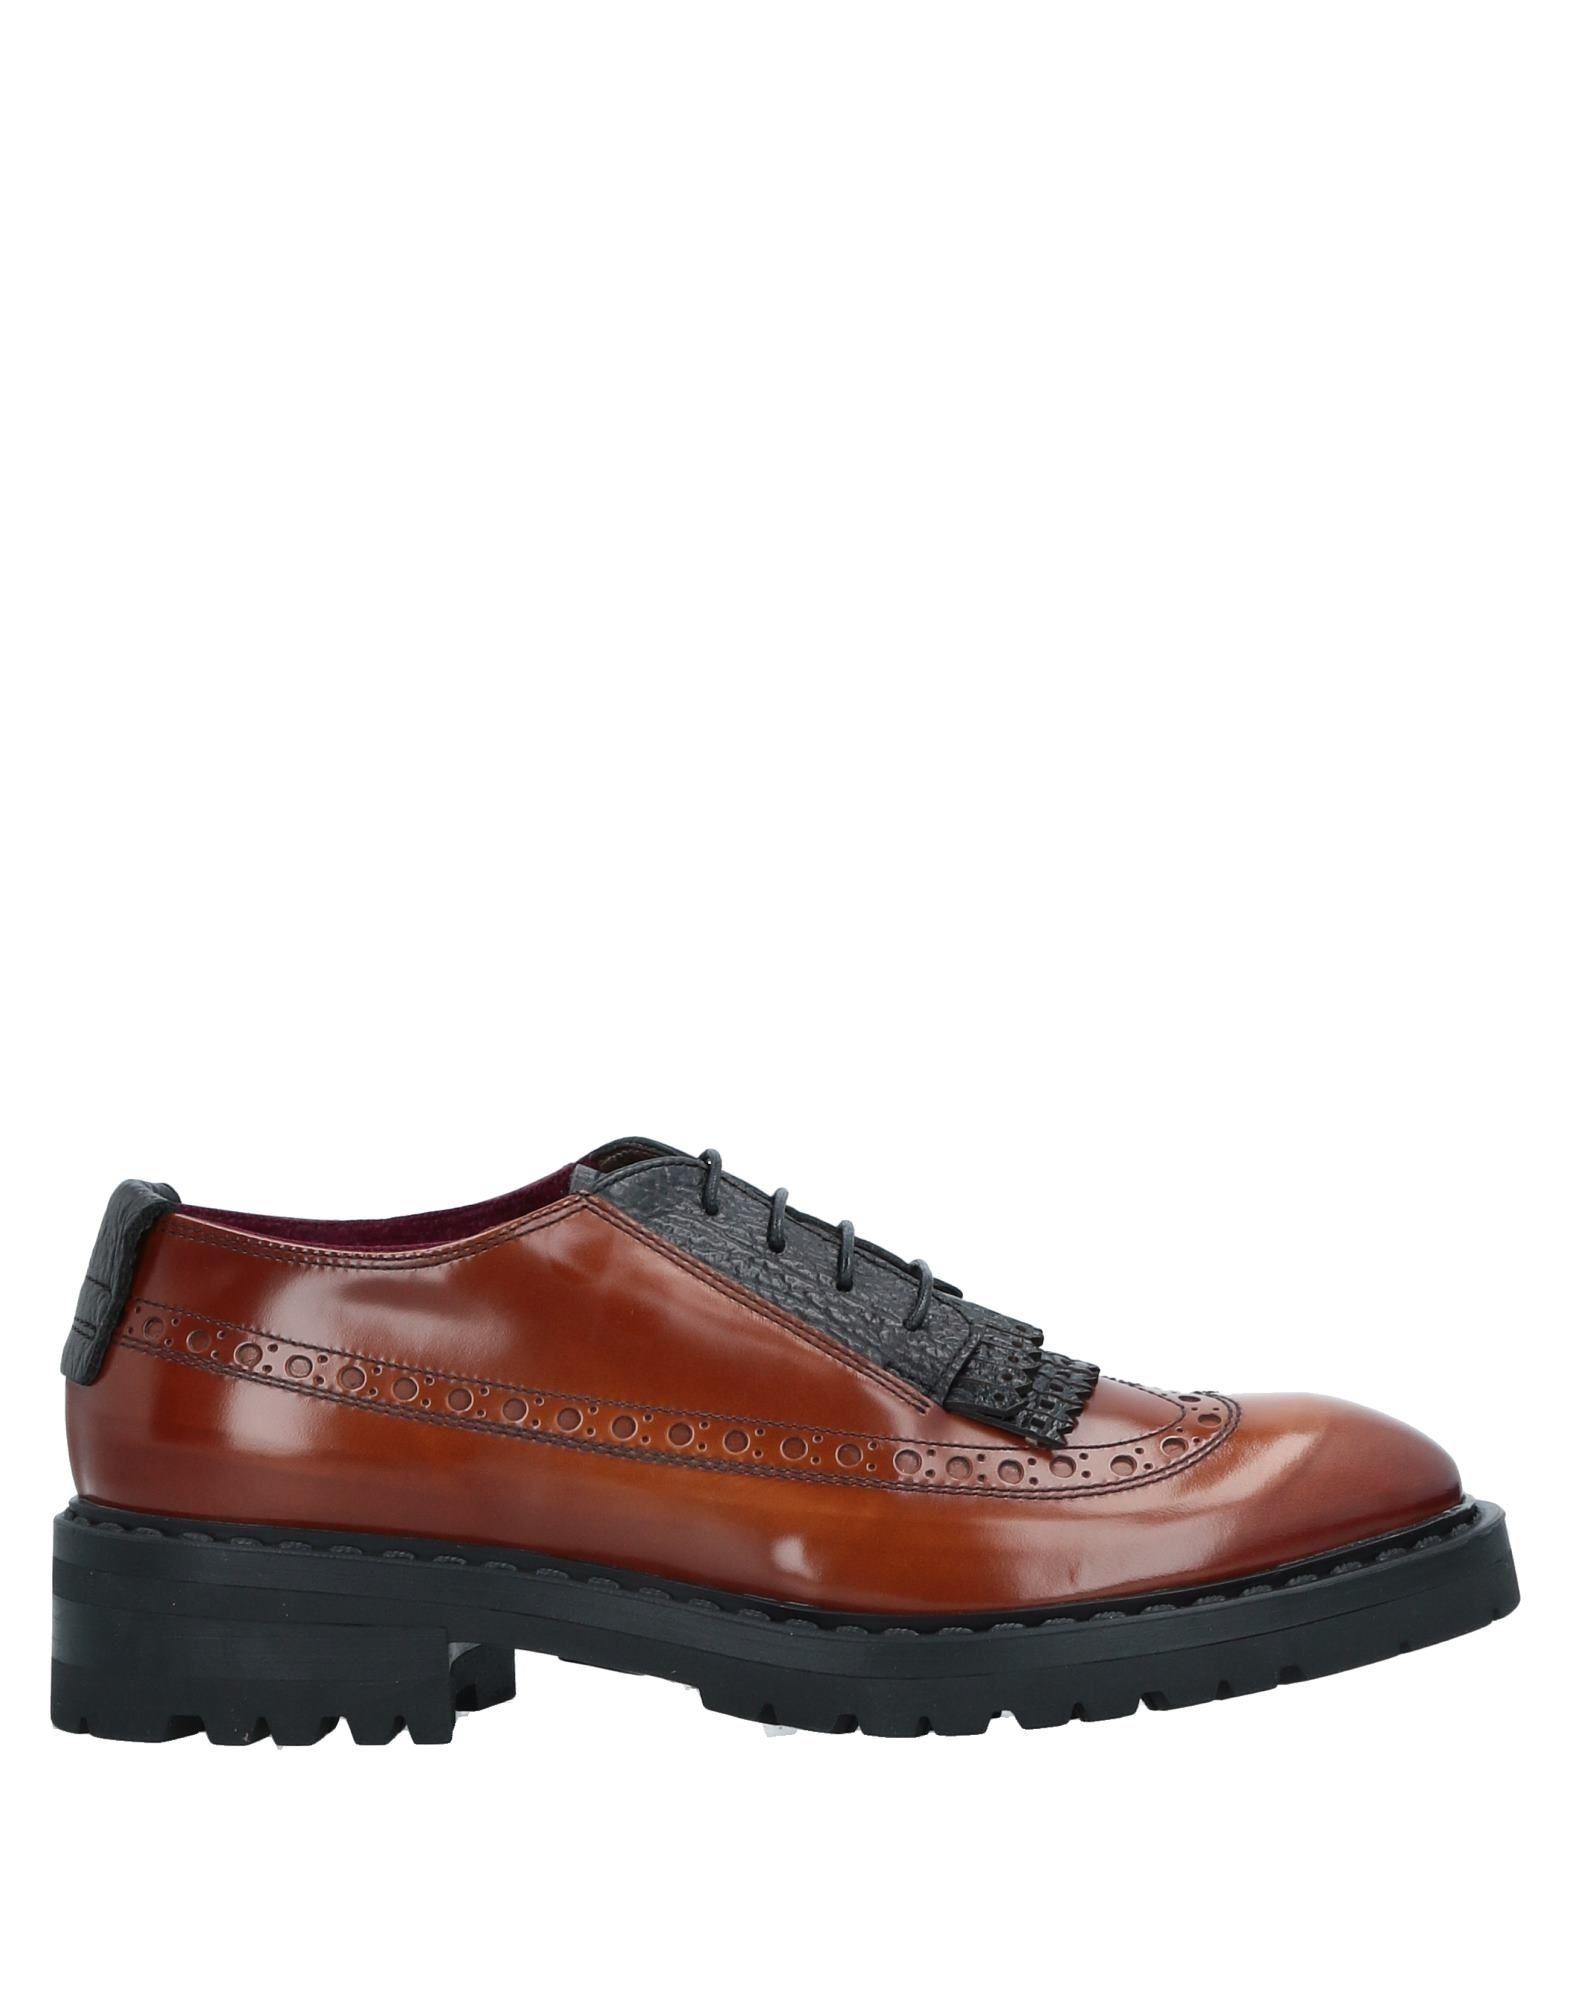 BARRACUDA Обувь на шнурках мужская обувь